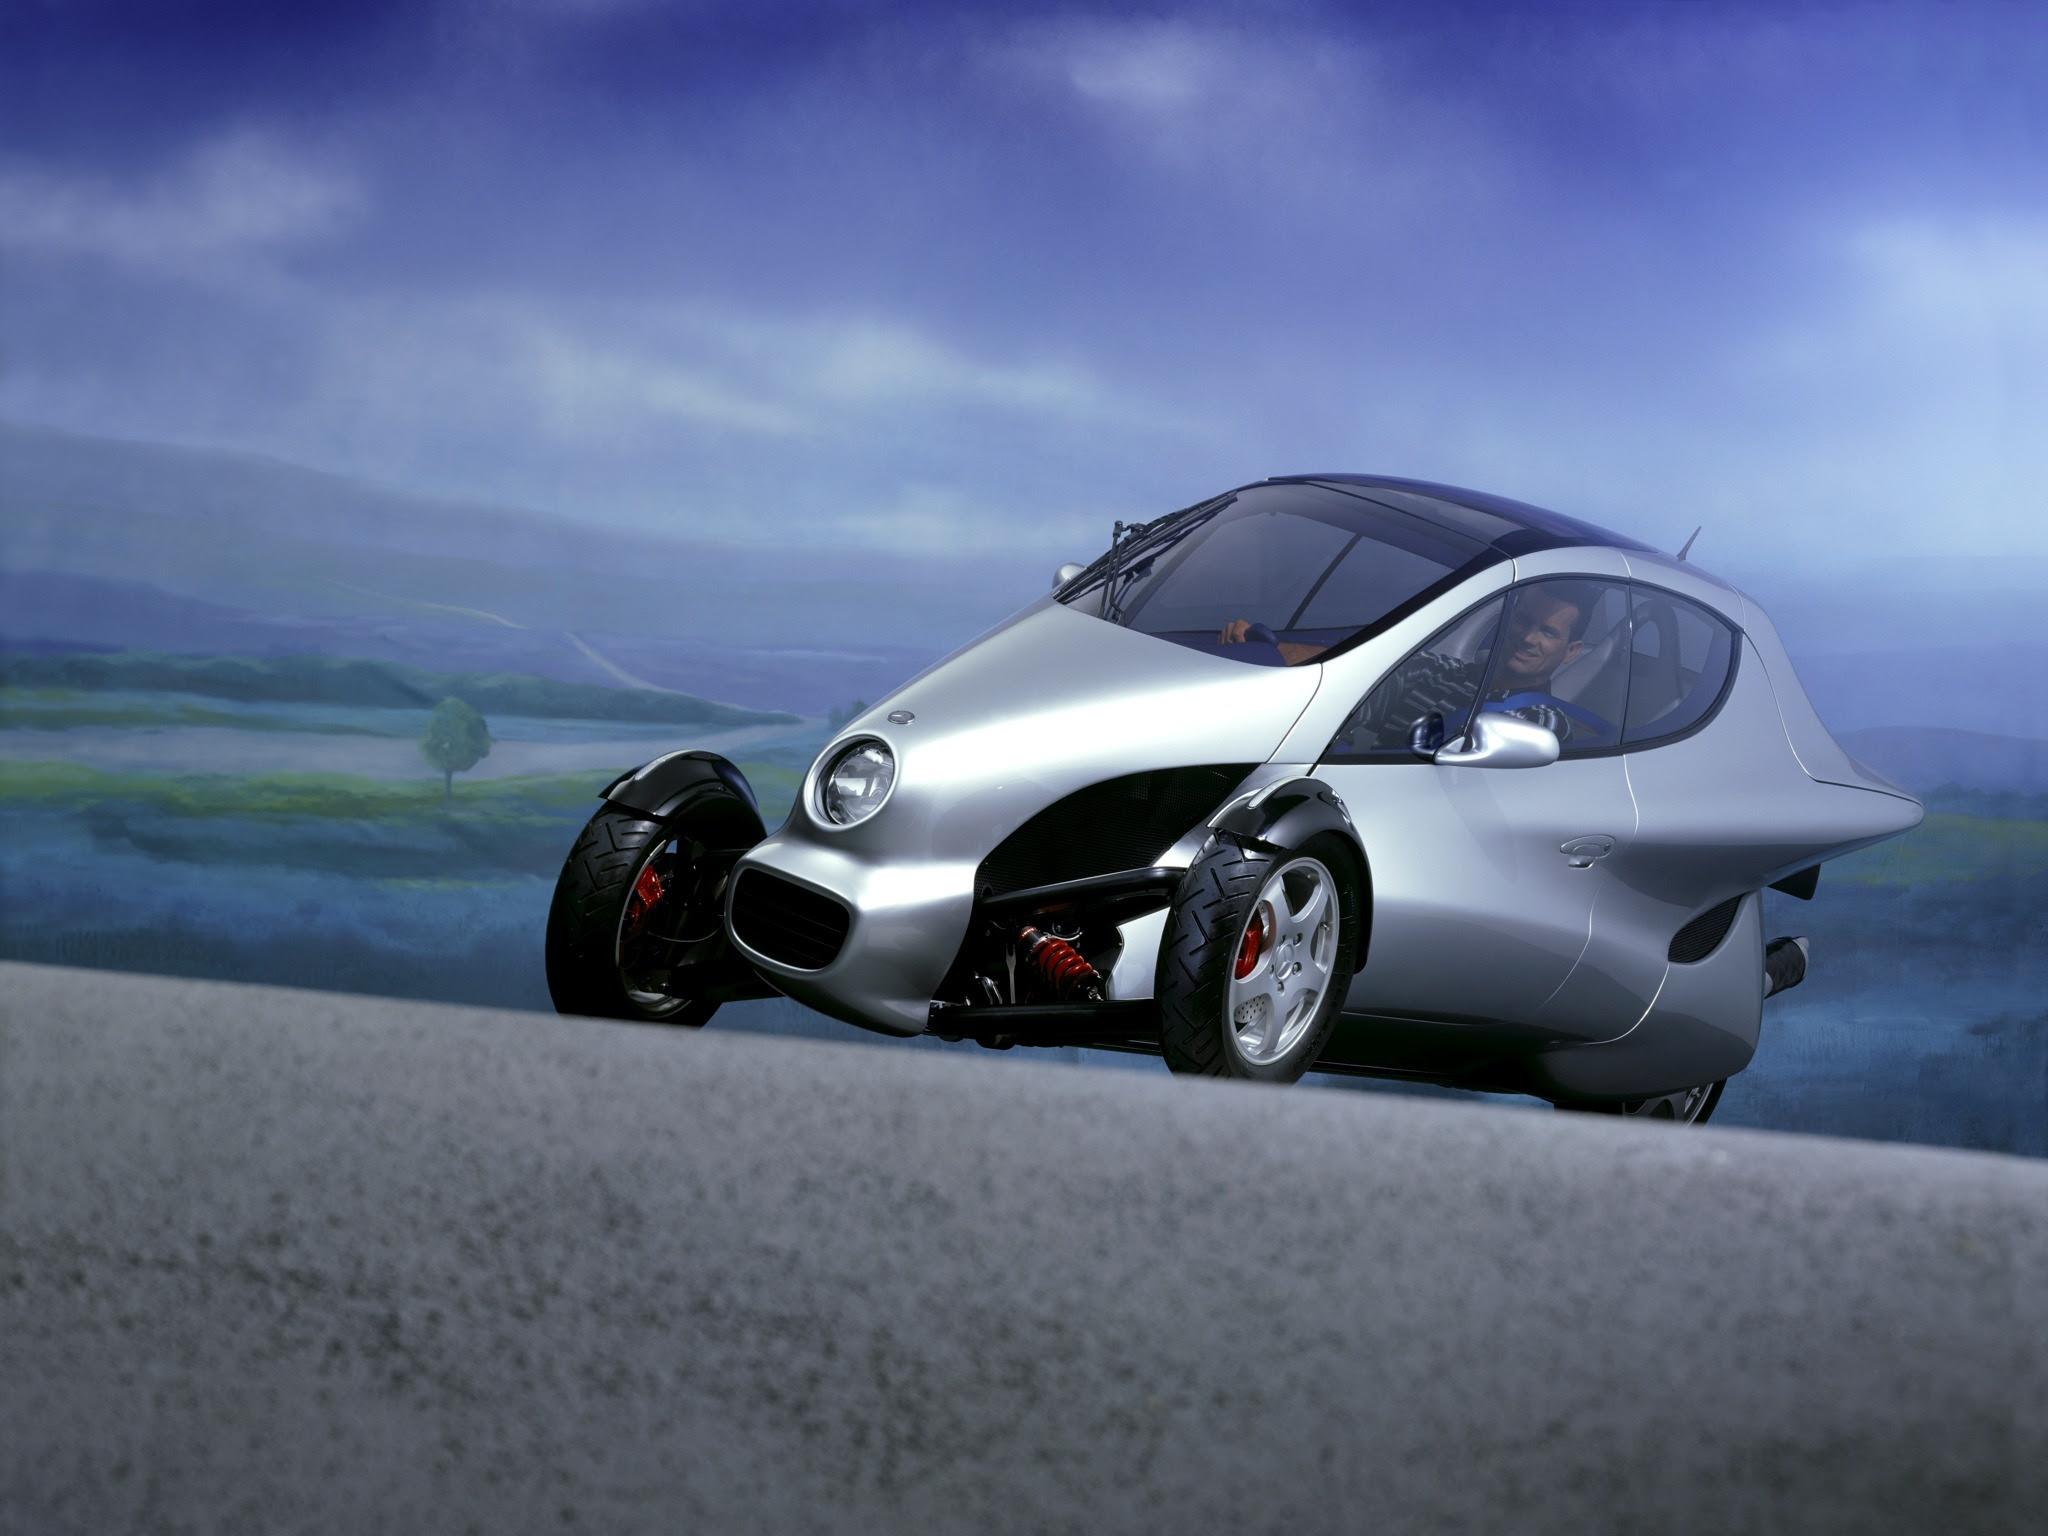 "Mercedes-Benz F300 ""Life Jet"" Concept (1997) - Old Concept ..."